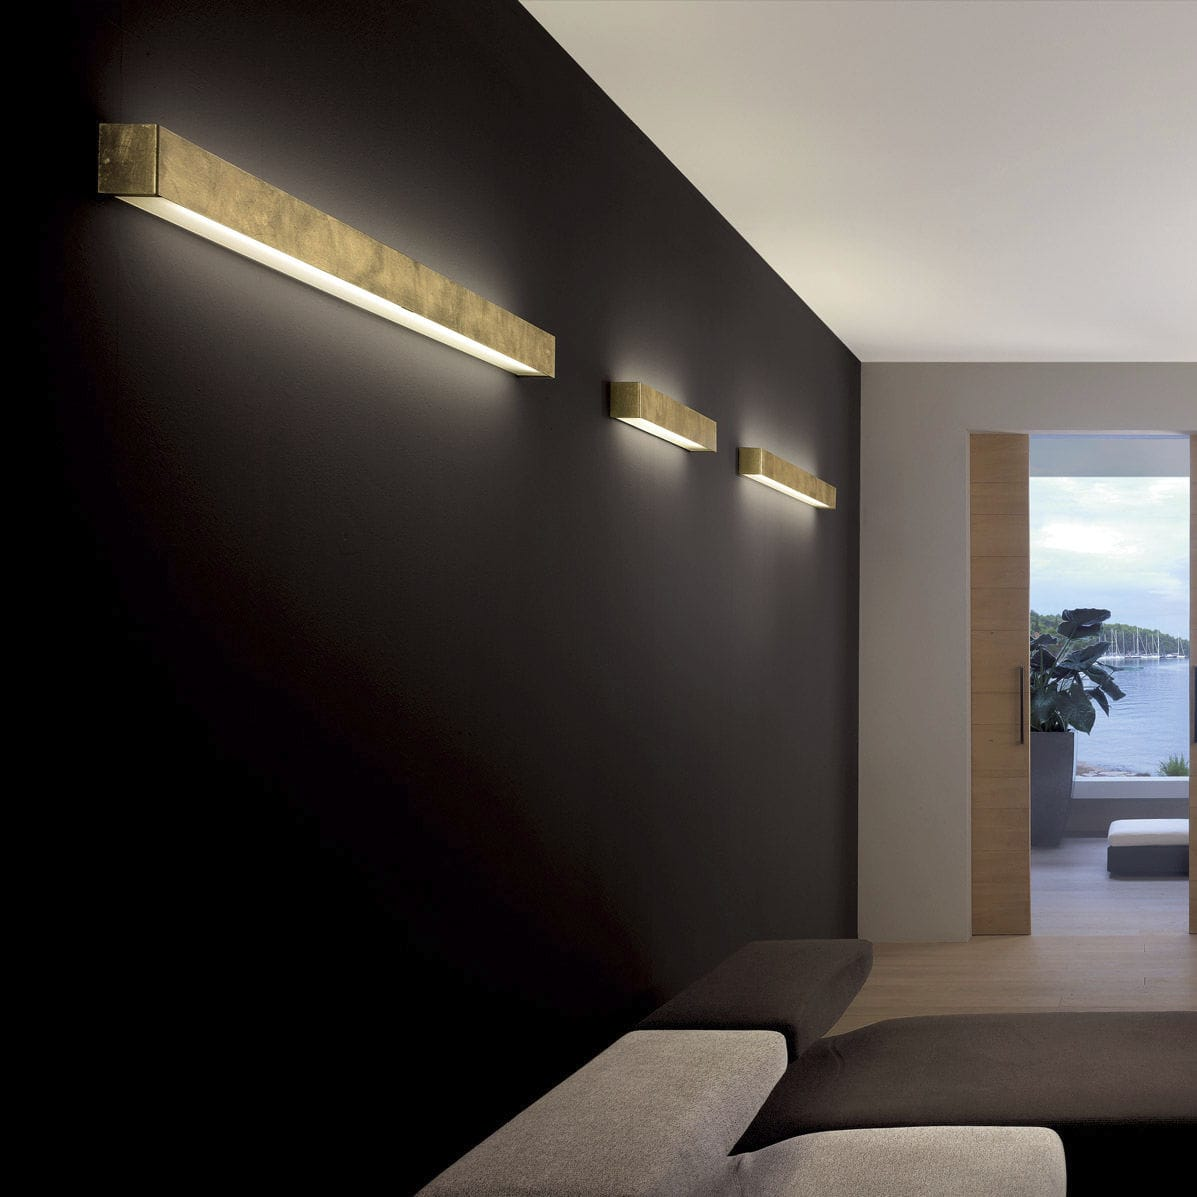 Contemporary Wall Light Box Oty Metal Led Linear